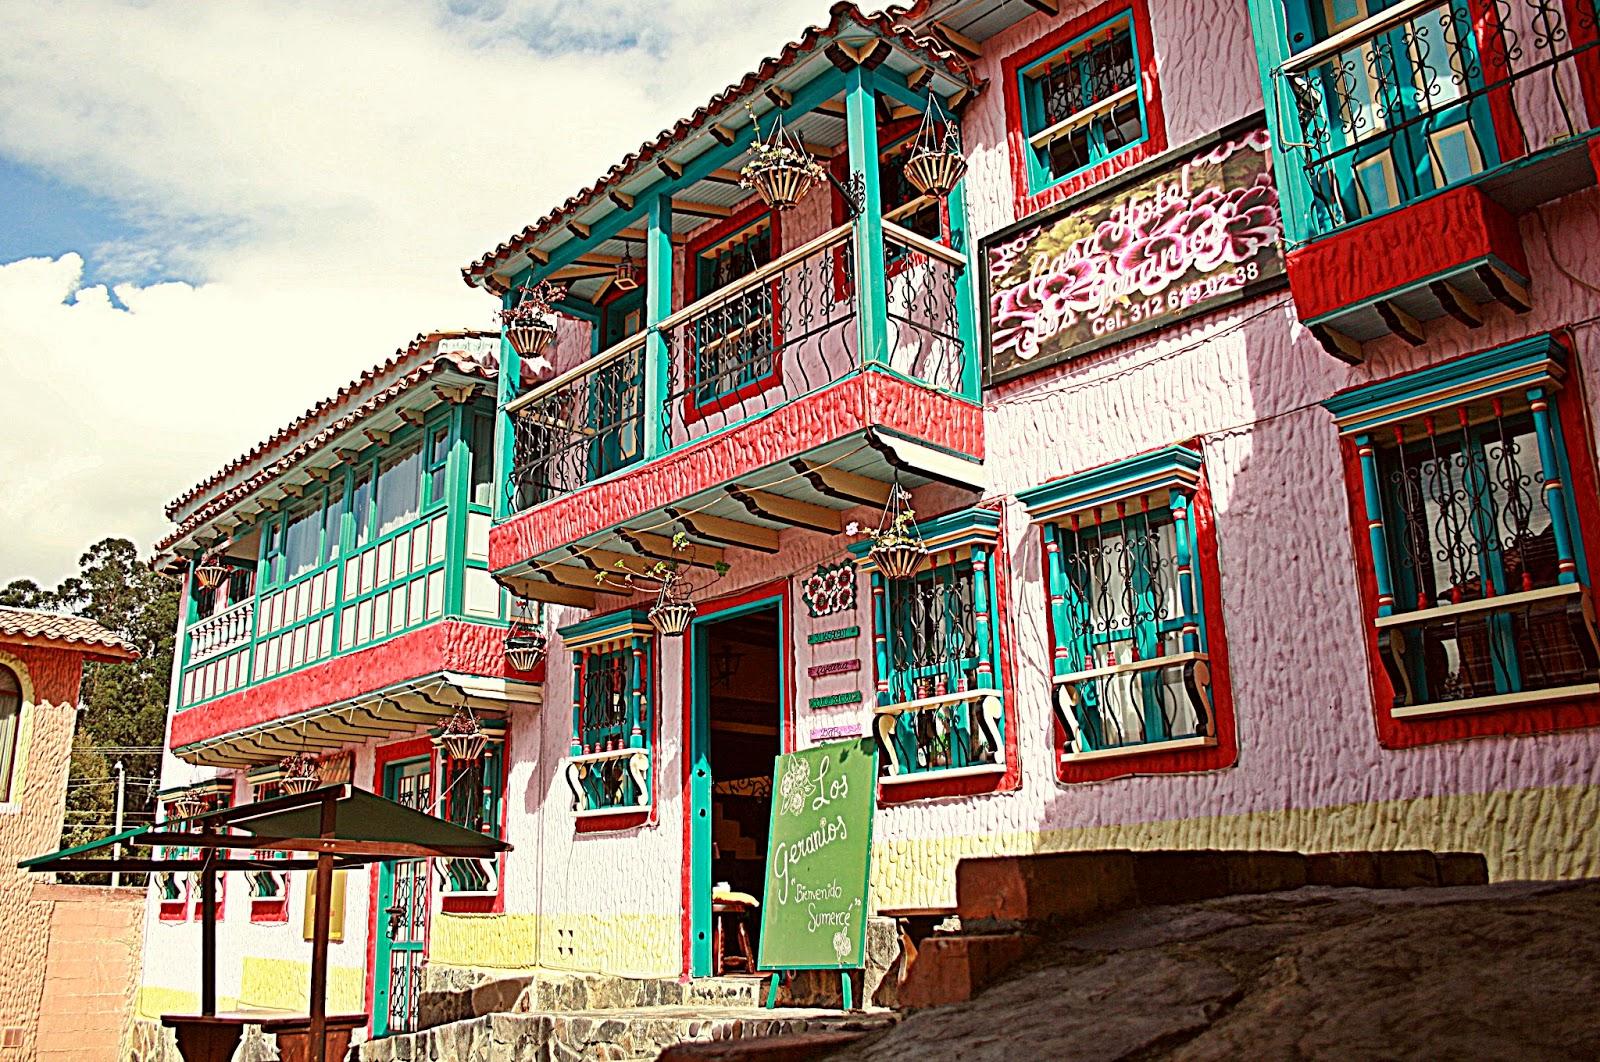 Hoteles Pueblito Boyacense Duitama # Muebles Duitama